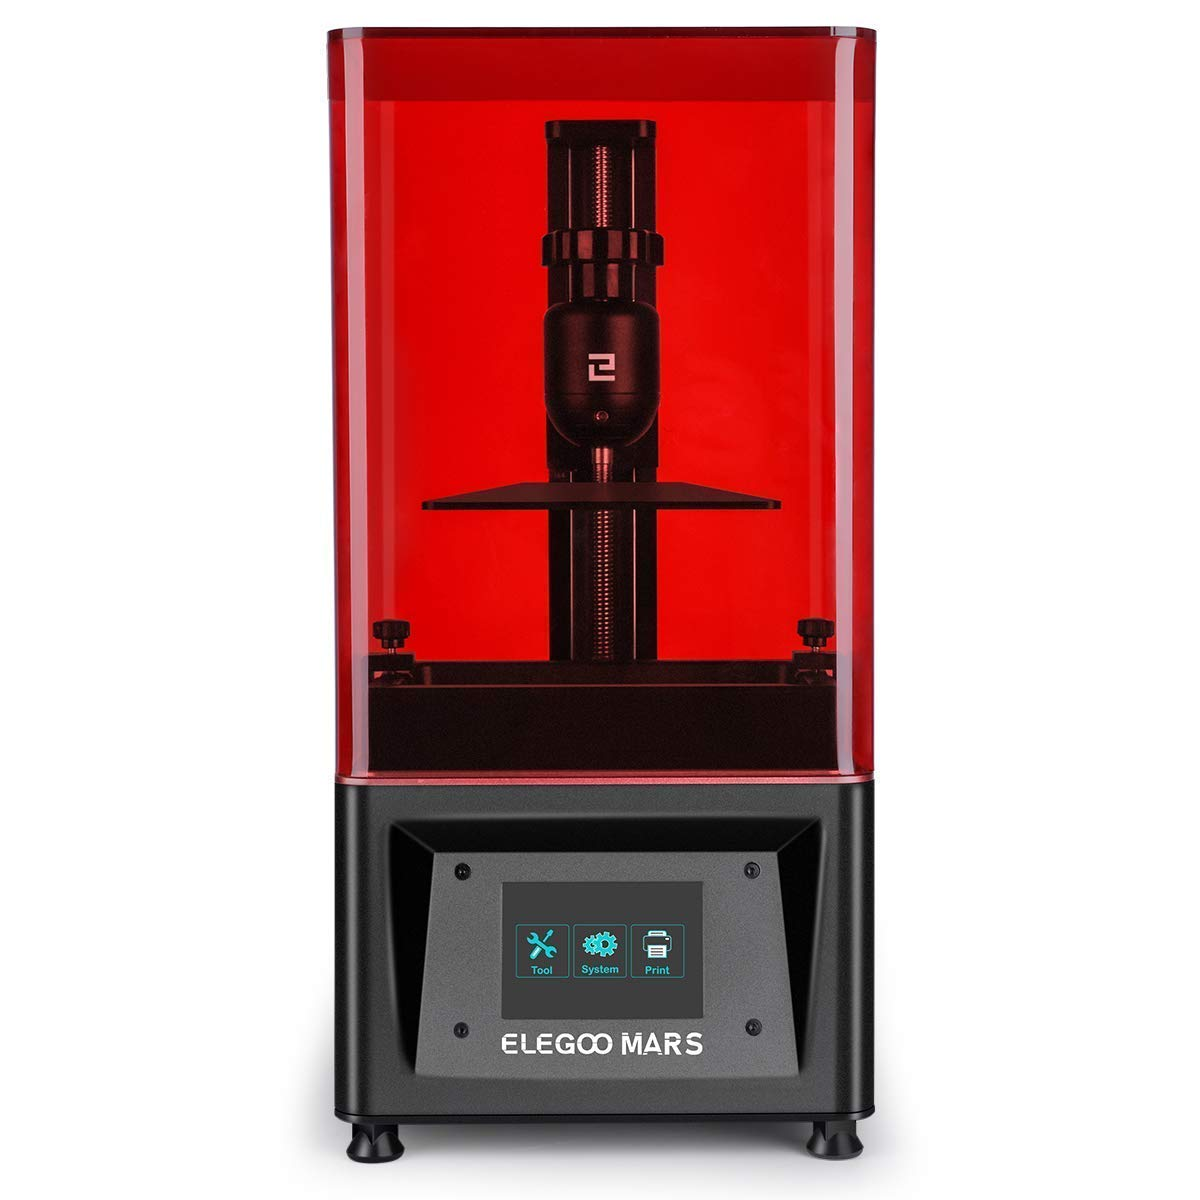 ELEGOO Mars UV Photocuring LCD 3D Printer and ELEGOO 2 PCS Metal Resin Tank Bundle